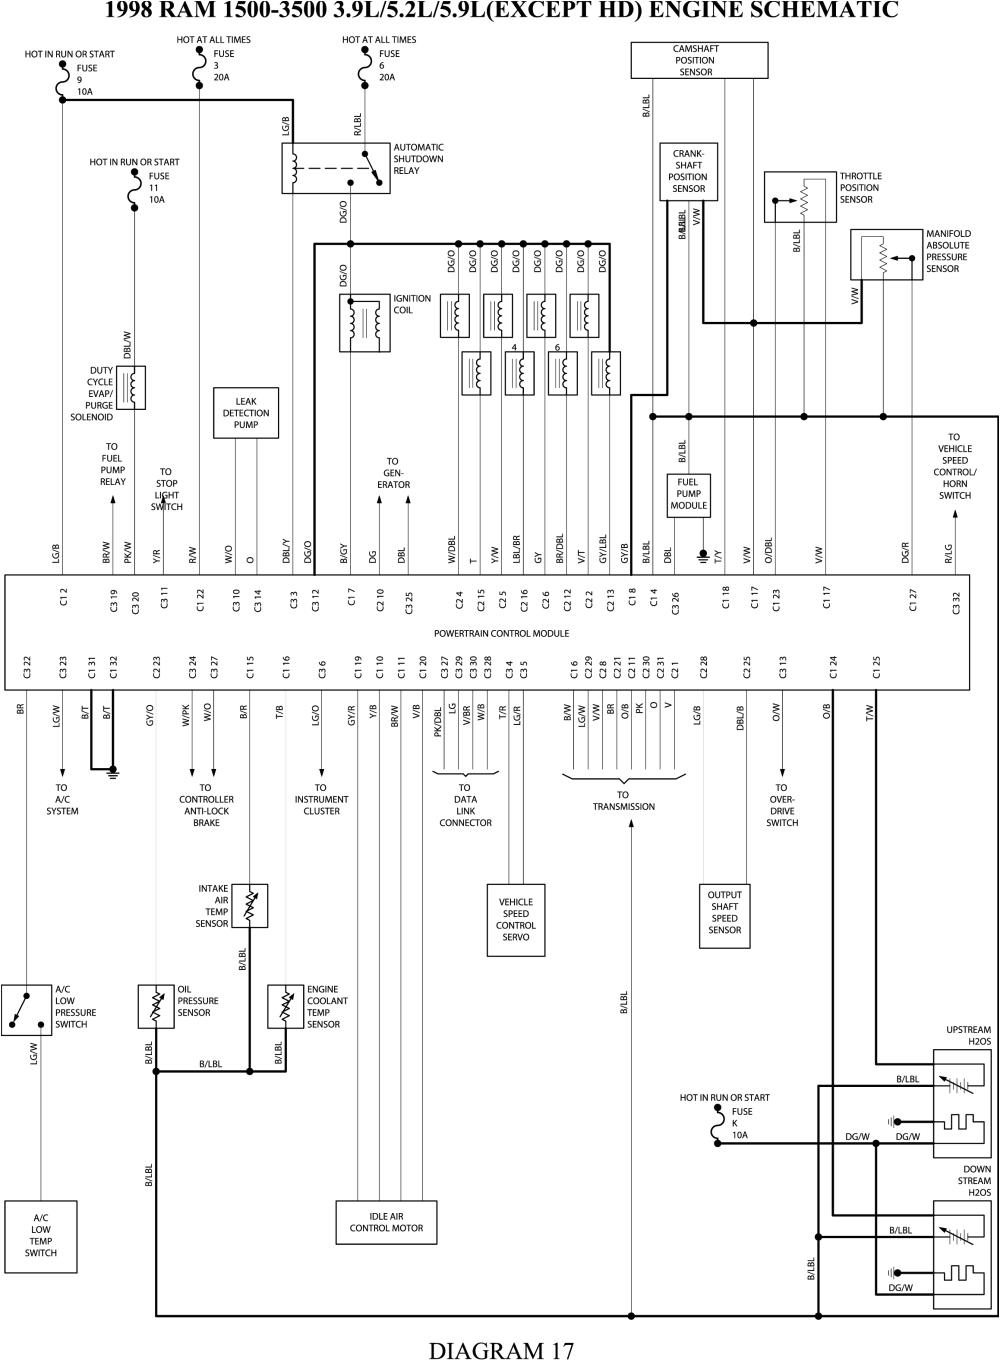 repair guides wiring diagrams wiring diagrams autozone com 1998 dodge dakota headlight wiring diagram 98 dodge dakota wiring diagram